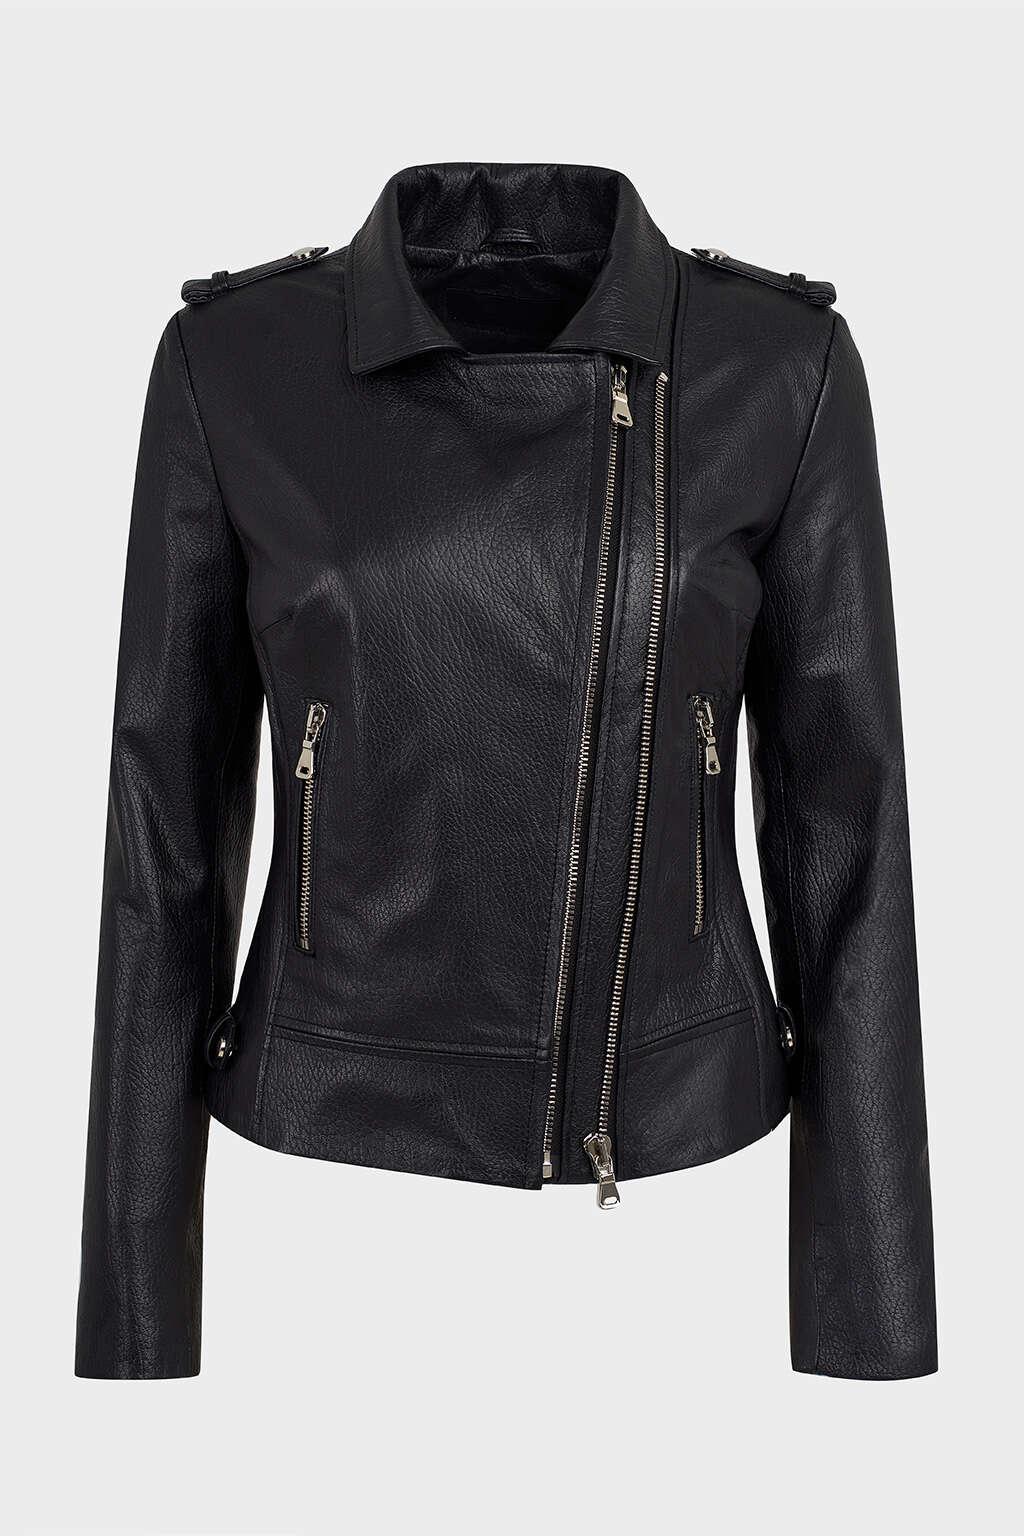 Front of Black Collared Biker Leather Jacket